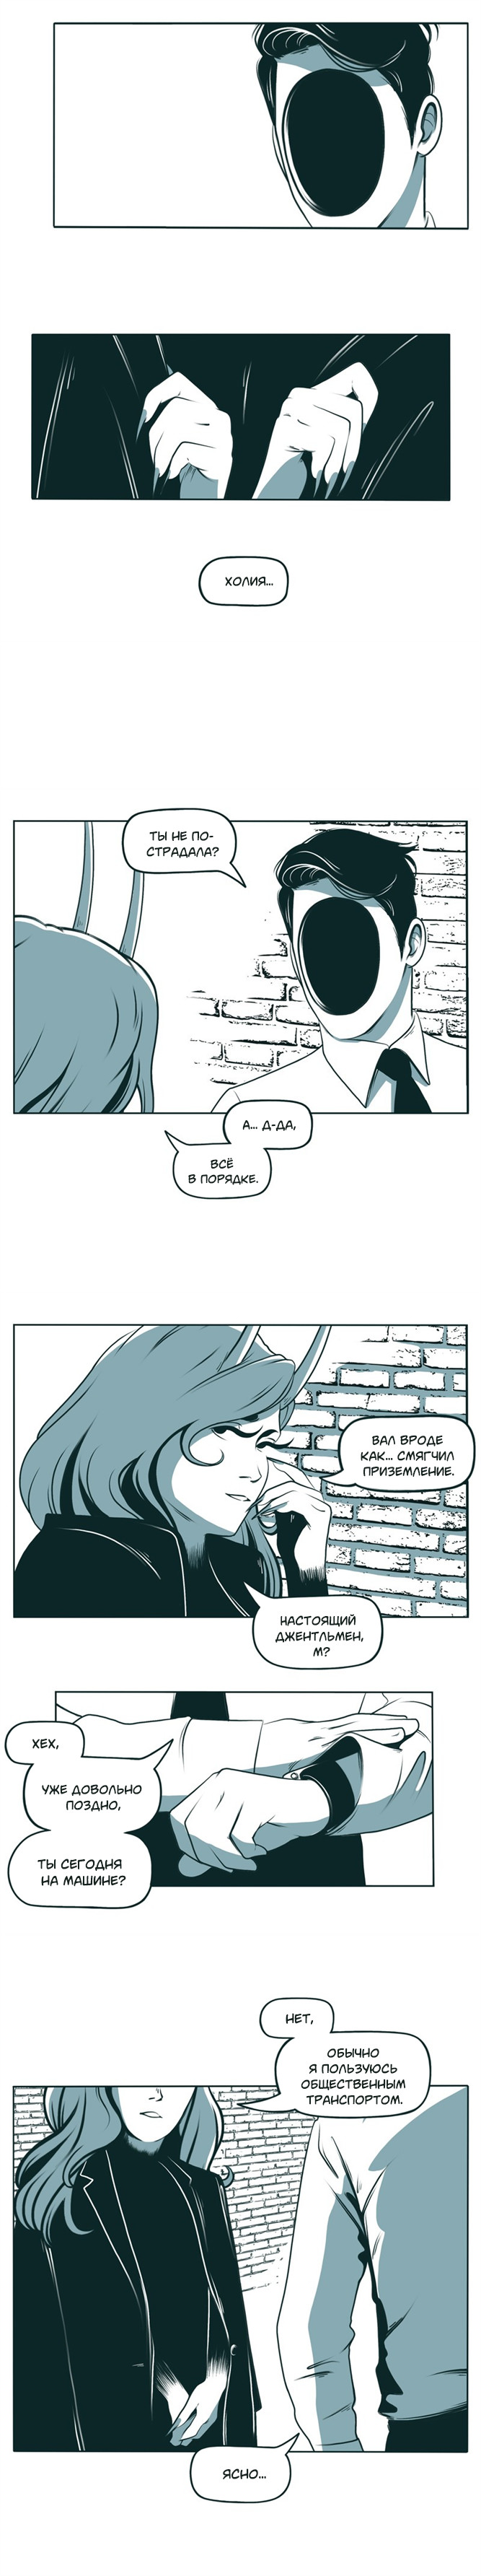 https://r1.ninemanga.com/comics/pic2/0/33536/420922/1534437761586.jpg Page 6